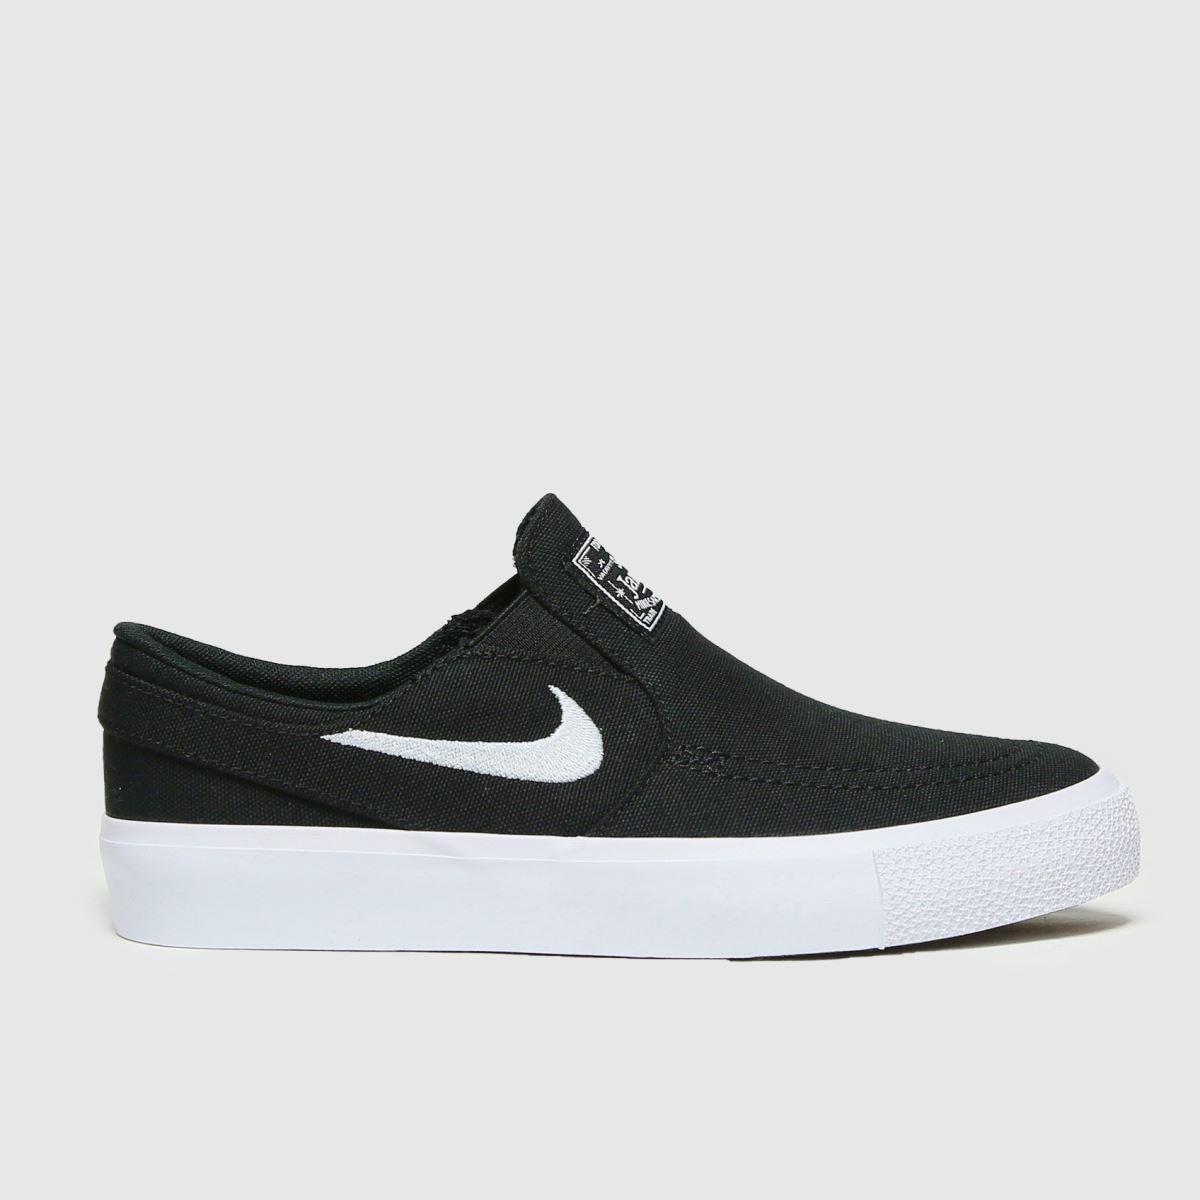 Nike SB Nike SB Black & White Stefan Janoski Slip Trainers Youth